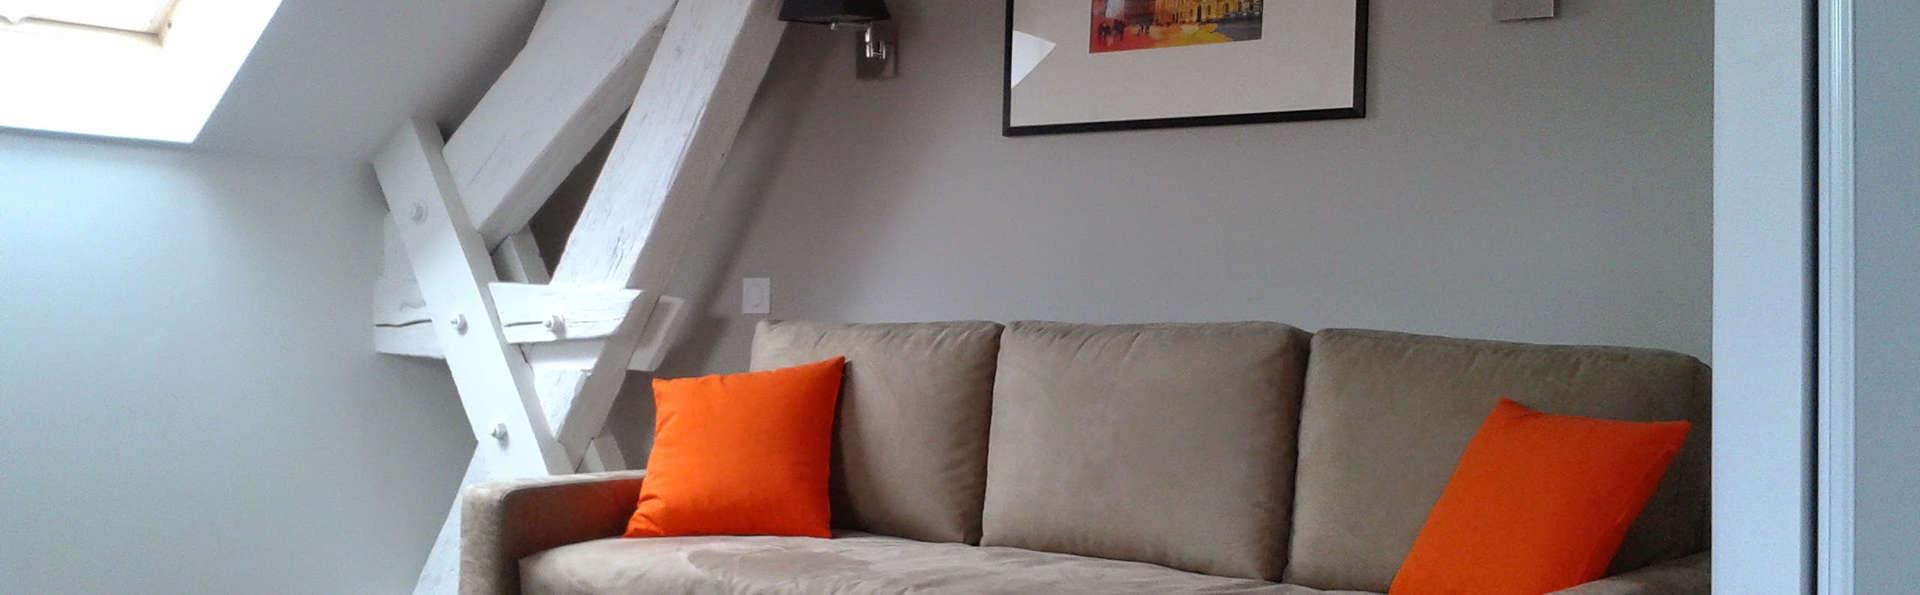 Apartamento familiar en Touluse